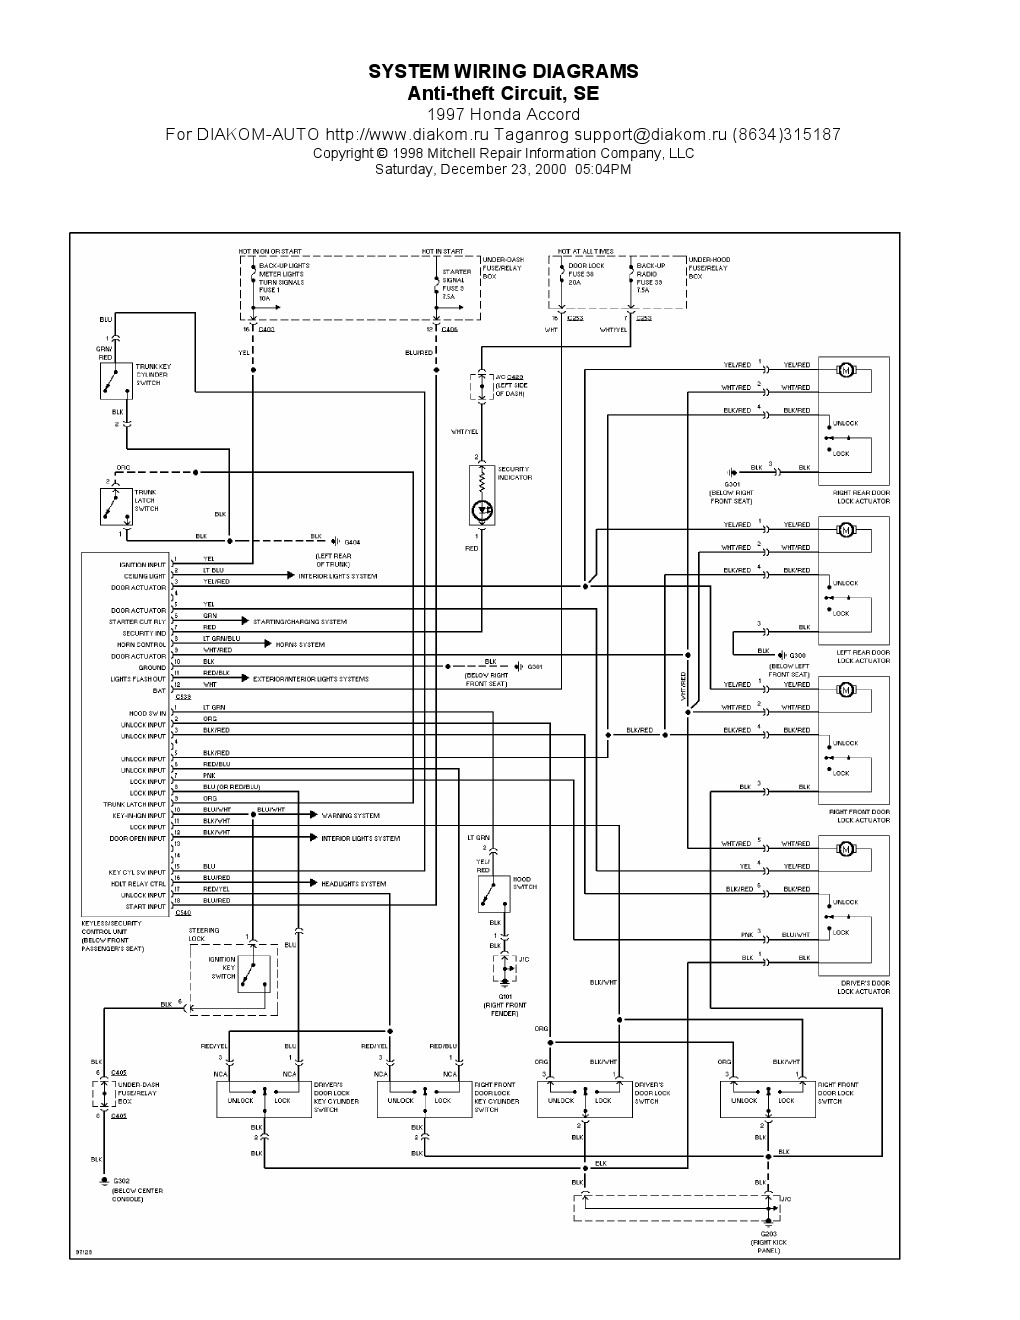 2012 Honda Odyssey Fuse Box Diagram Civic Wiring Hood Lock Trusted Diagrams 1020x1320